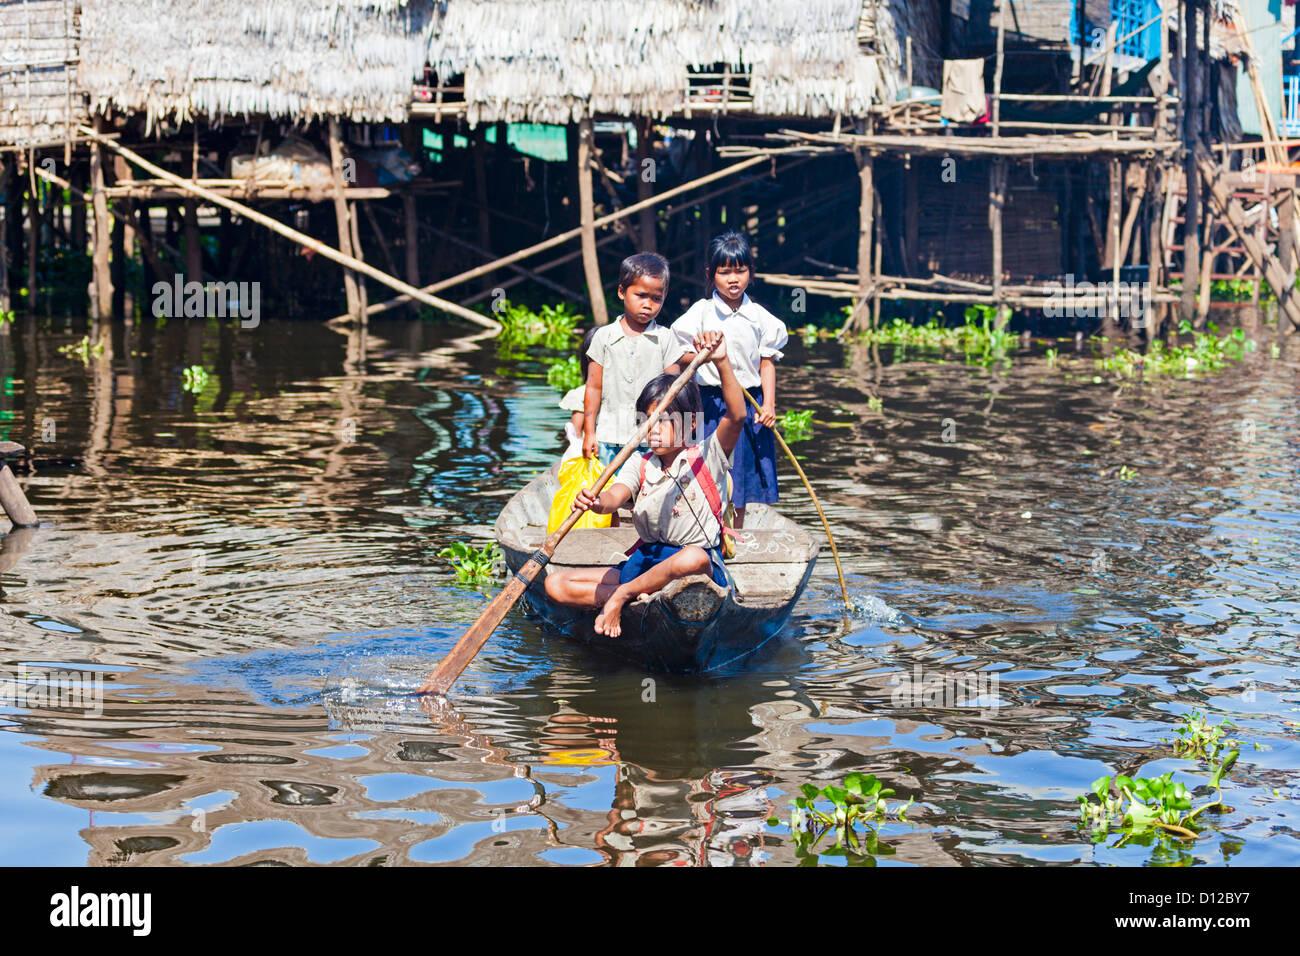 Floating fishing village in Cambodia - Stock Image